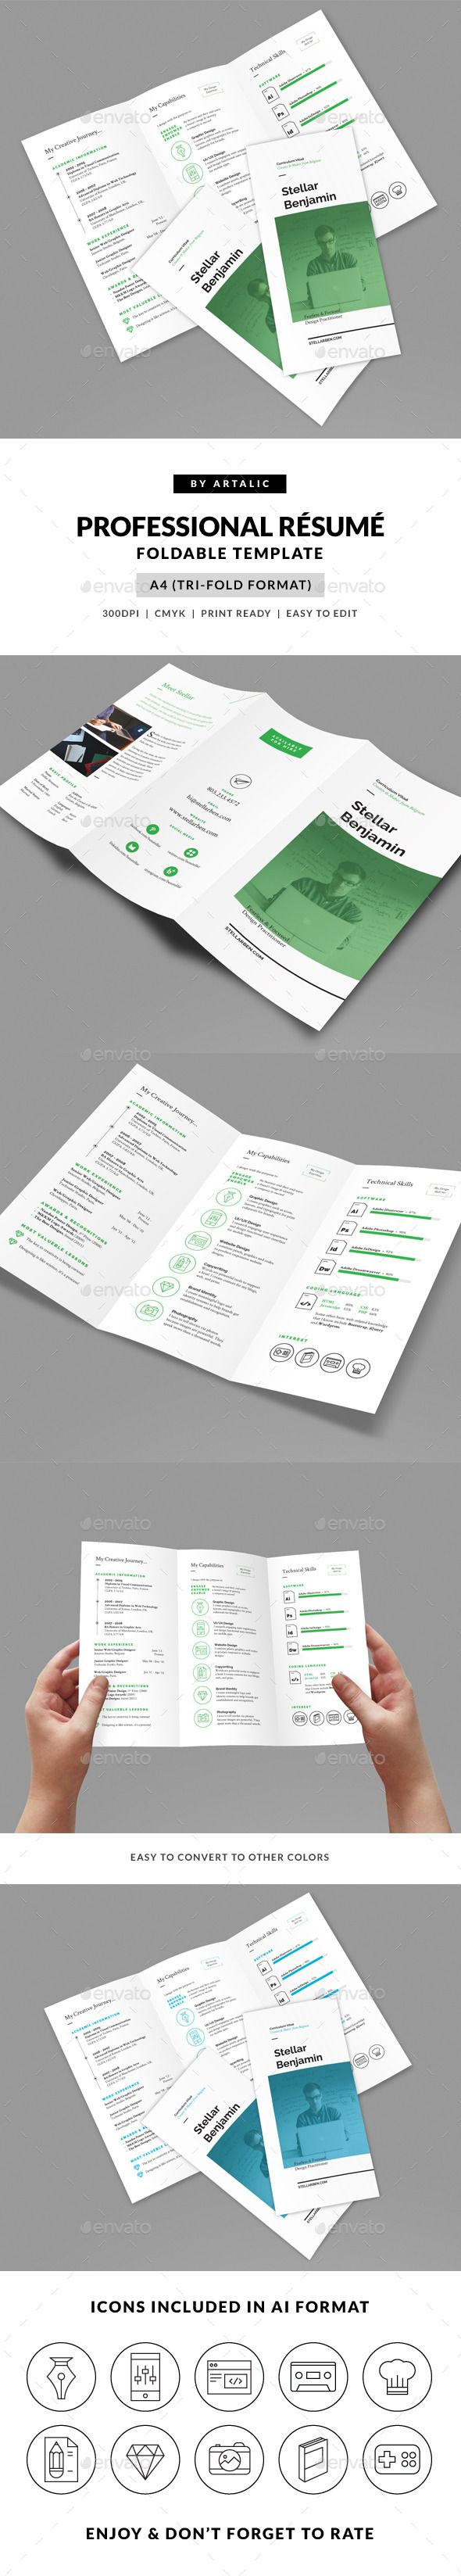 stellar tri fold resume cv resume cv cv template and